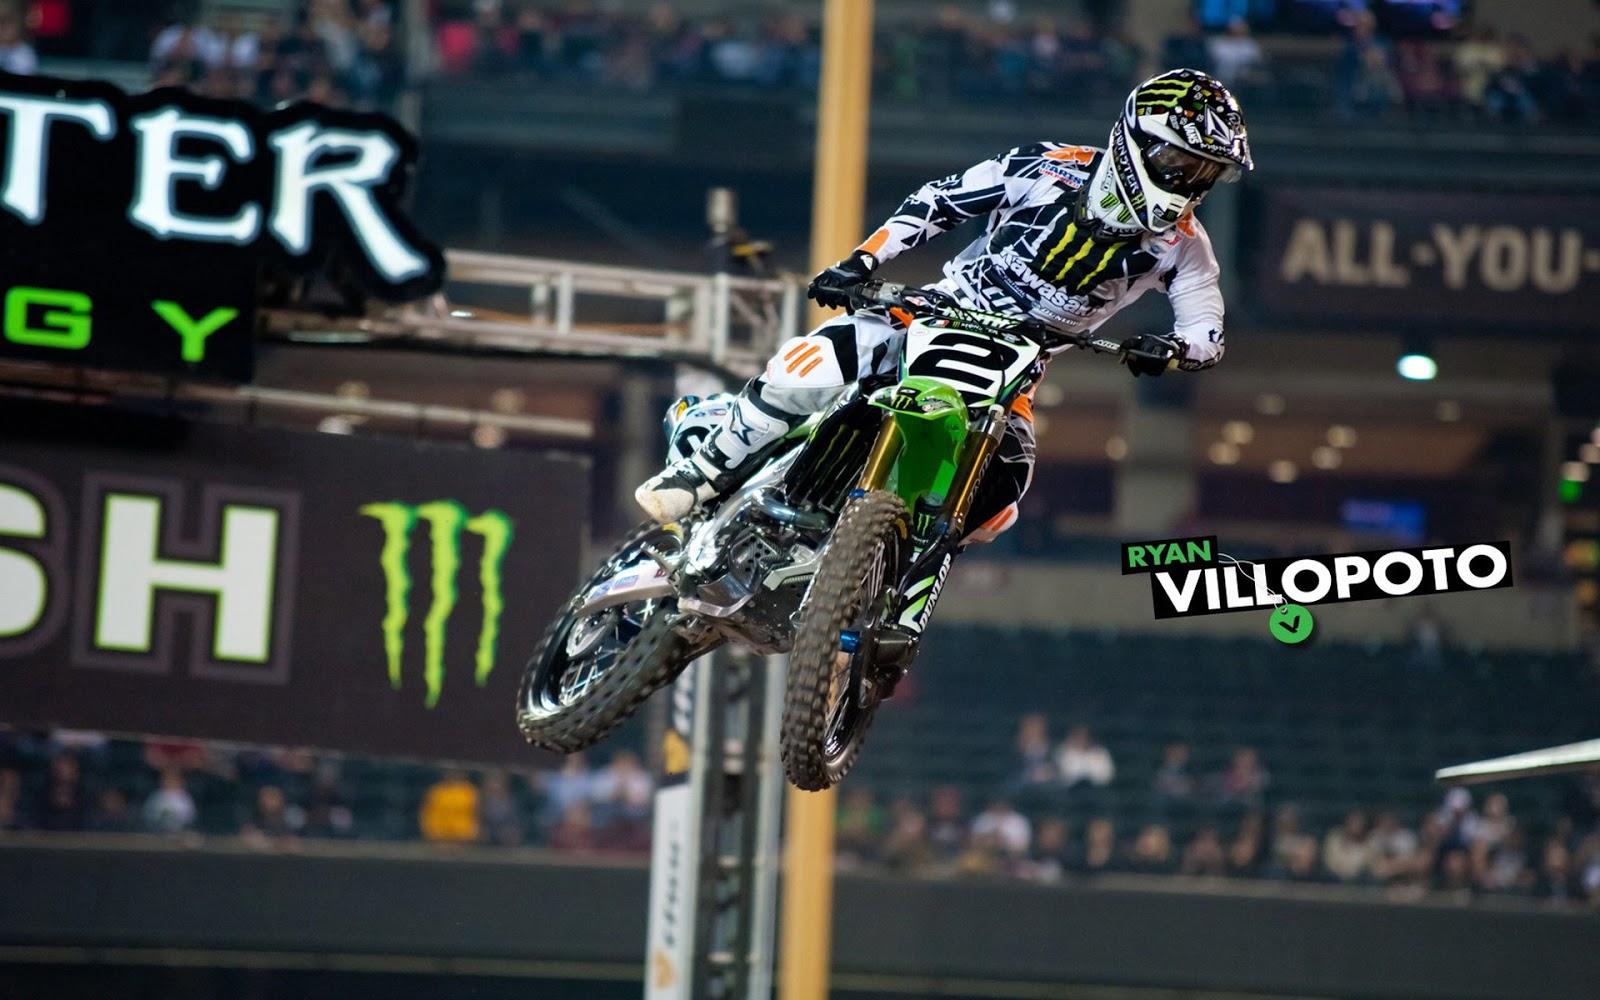 Ryan Villopoto